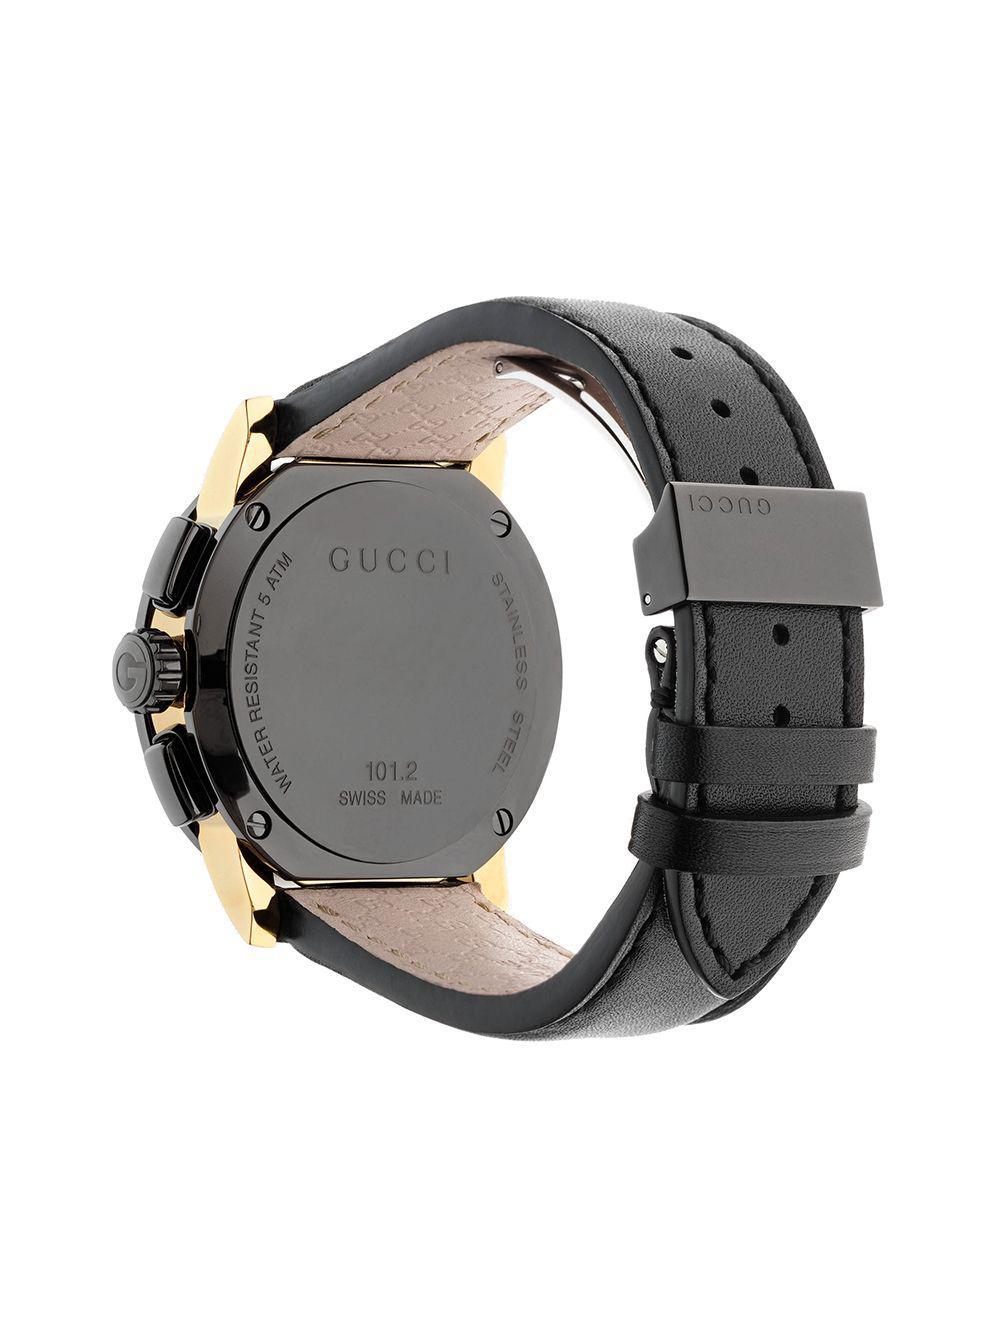 9dbf12d5b Lyst - Gucci G-chrono, 44mm in Black for Men